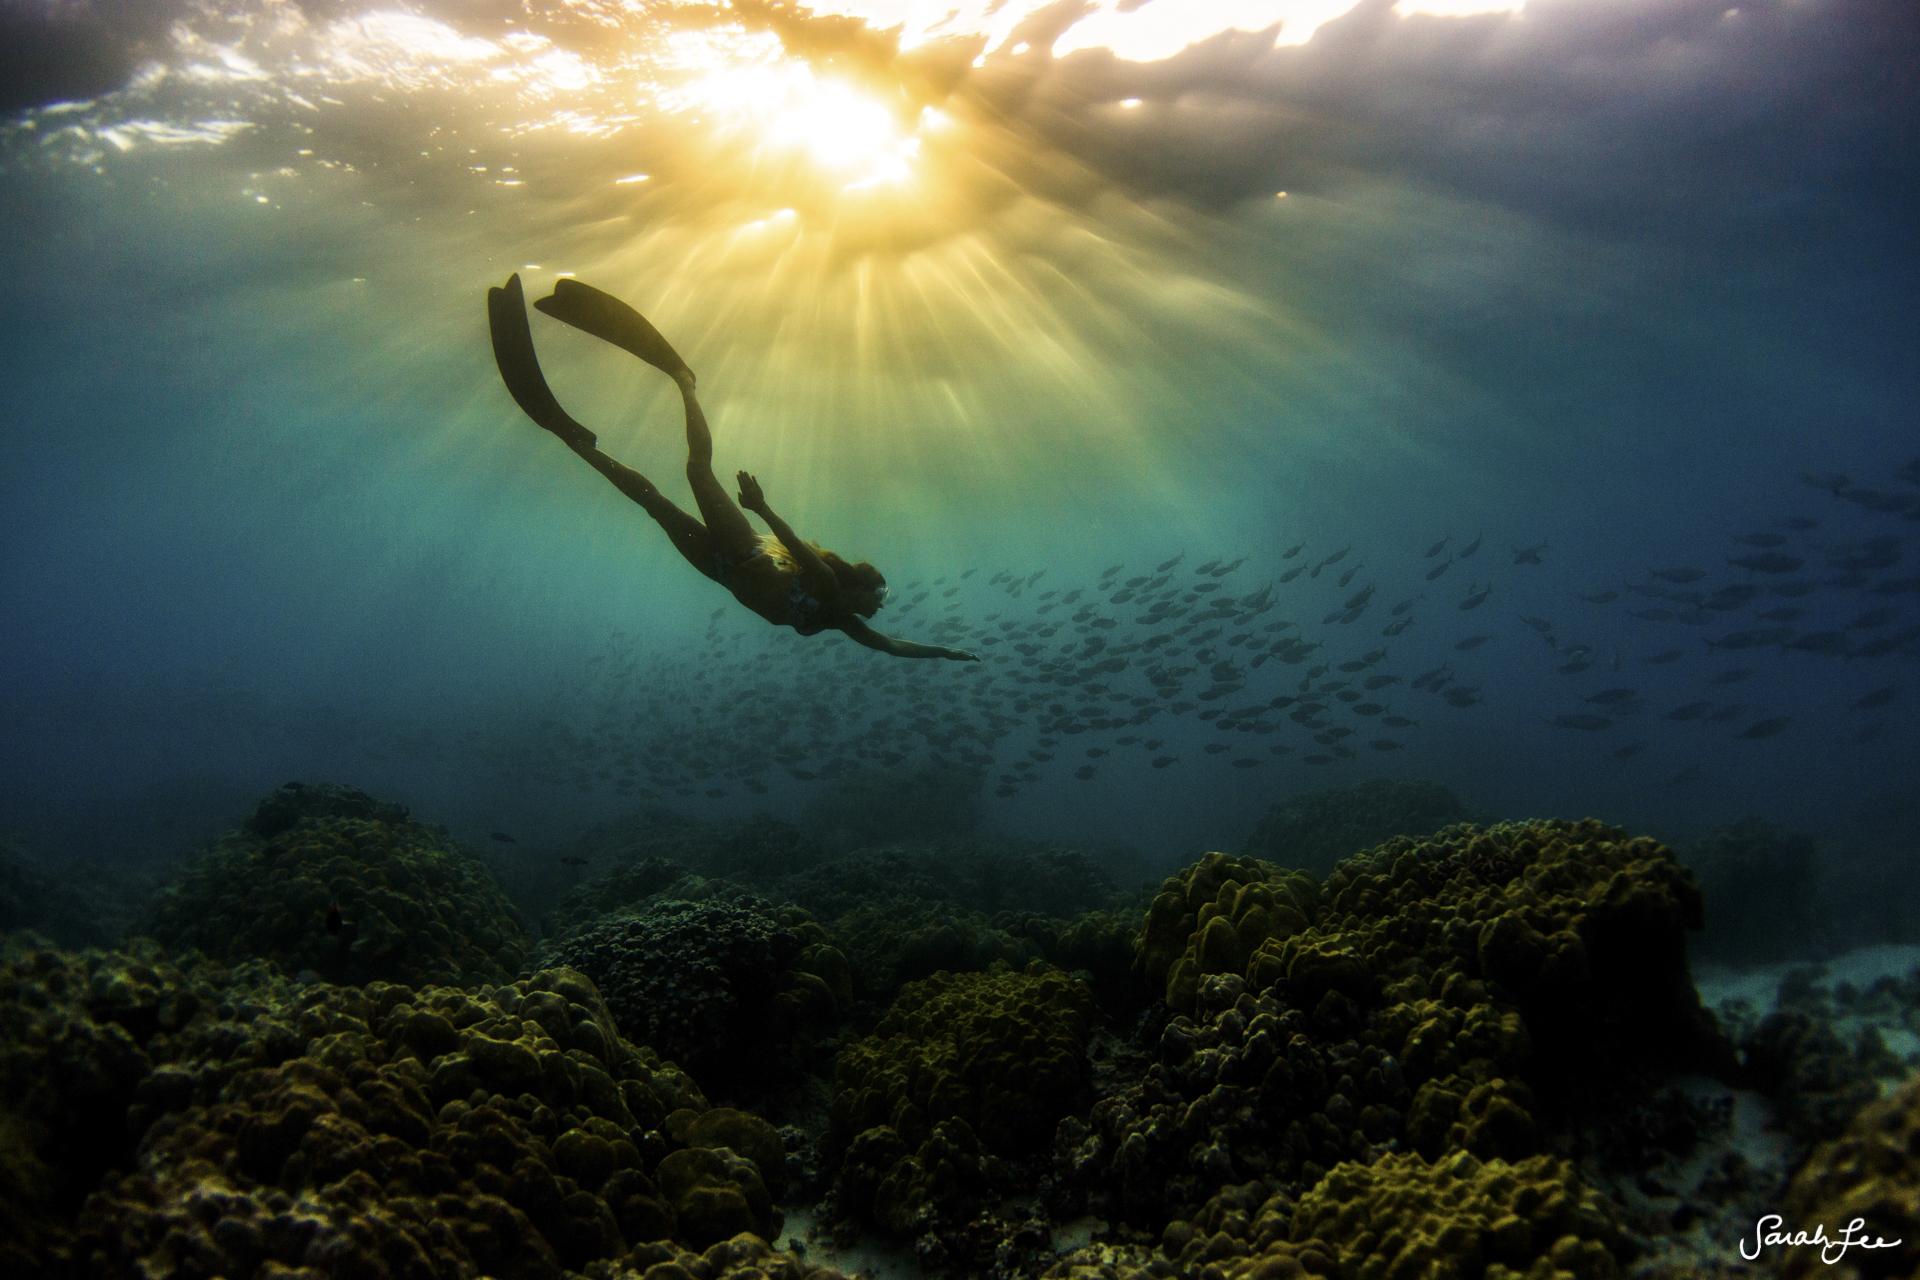 030_Sarah_Lee_Photography_Underwater_150207.jpg